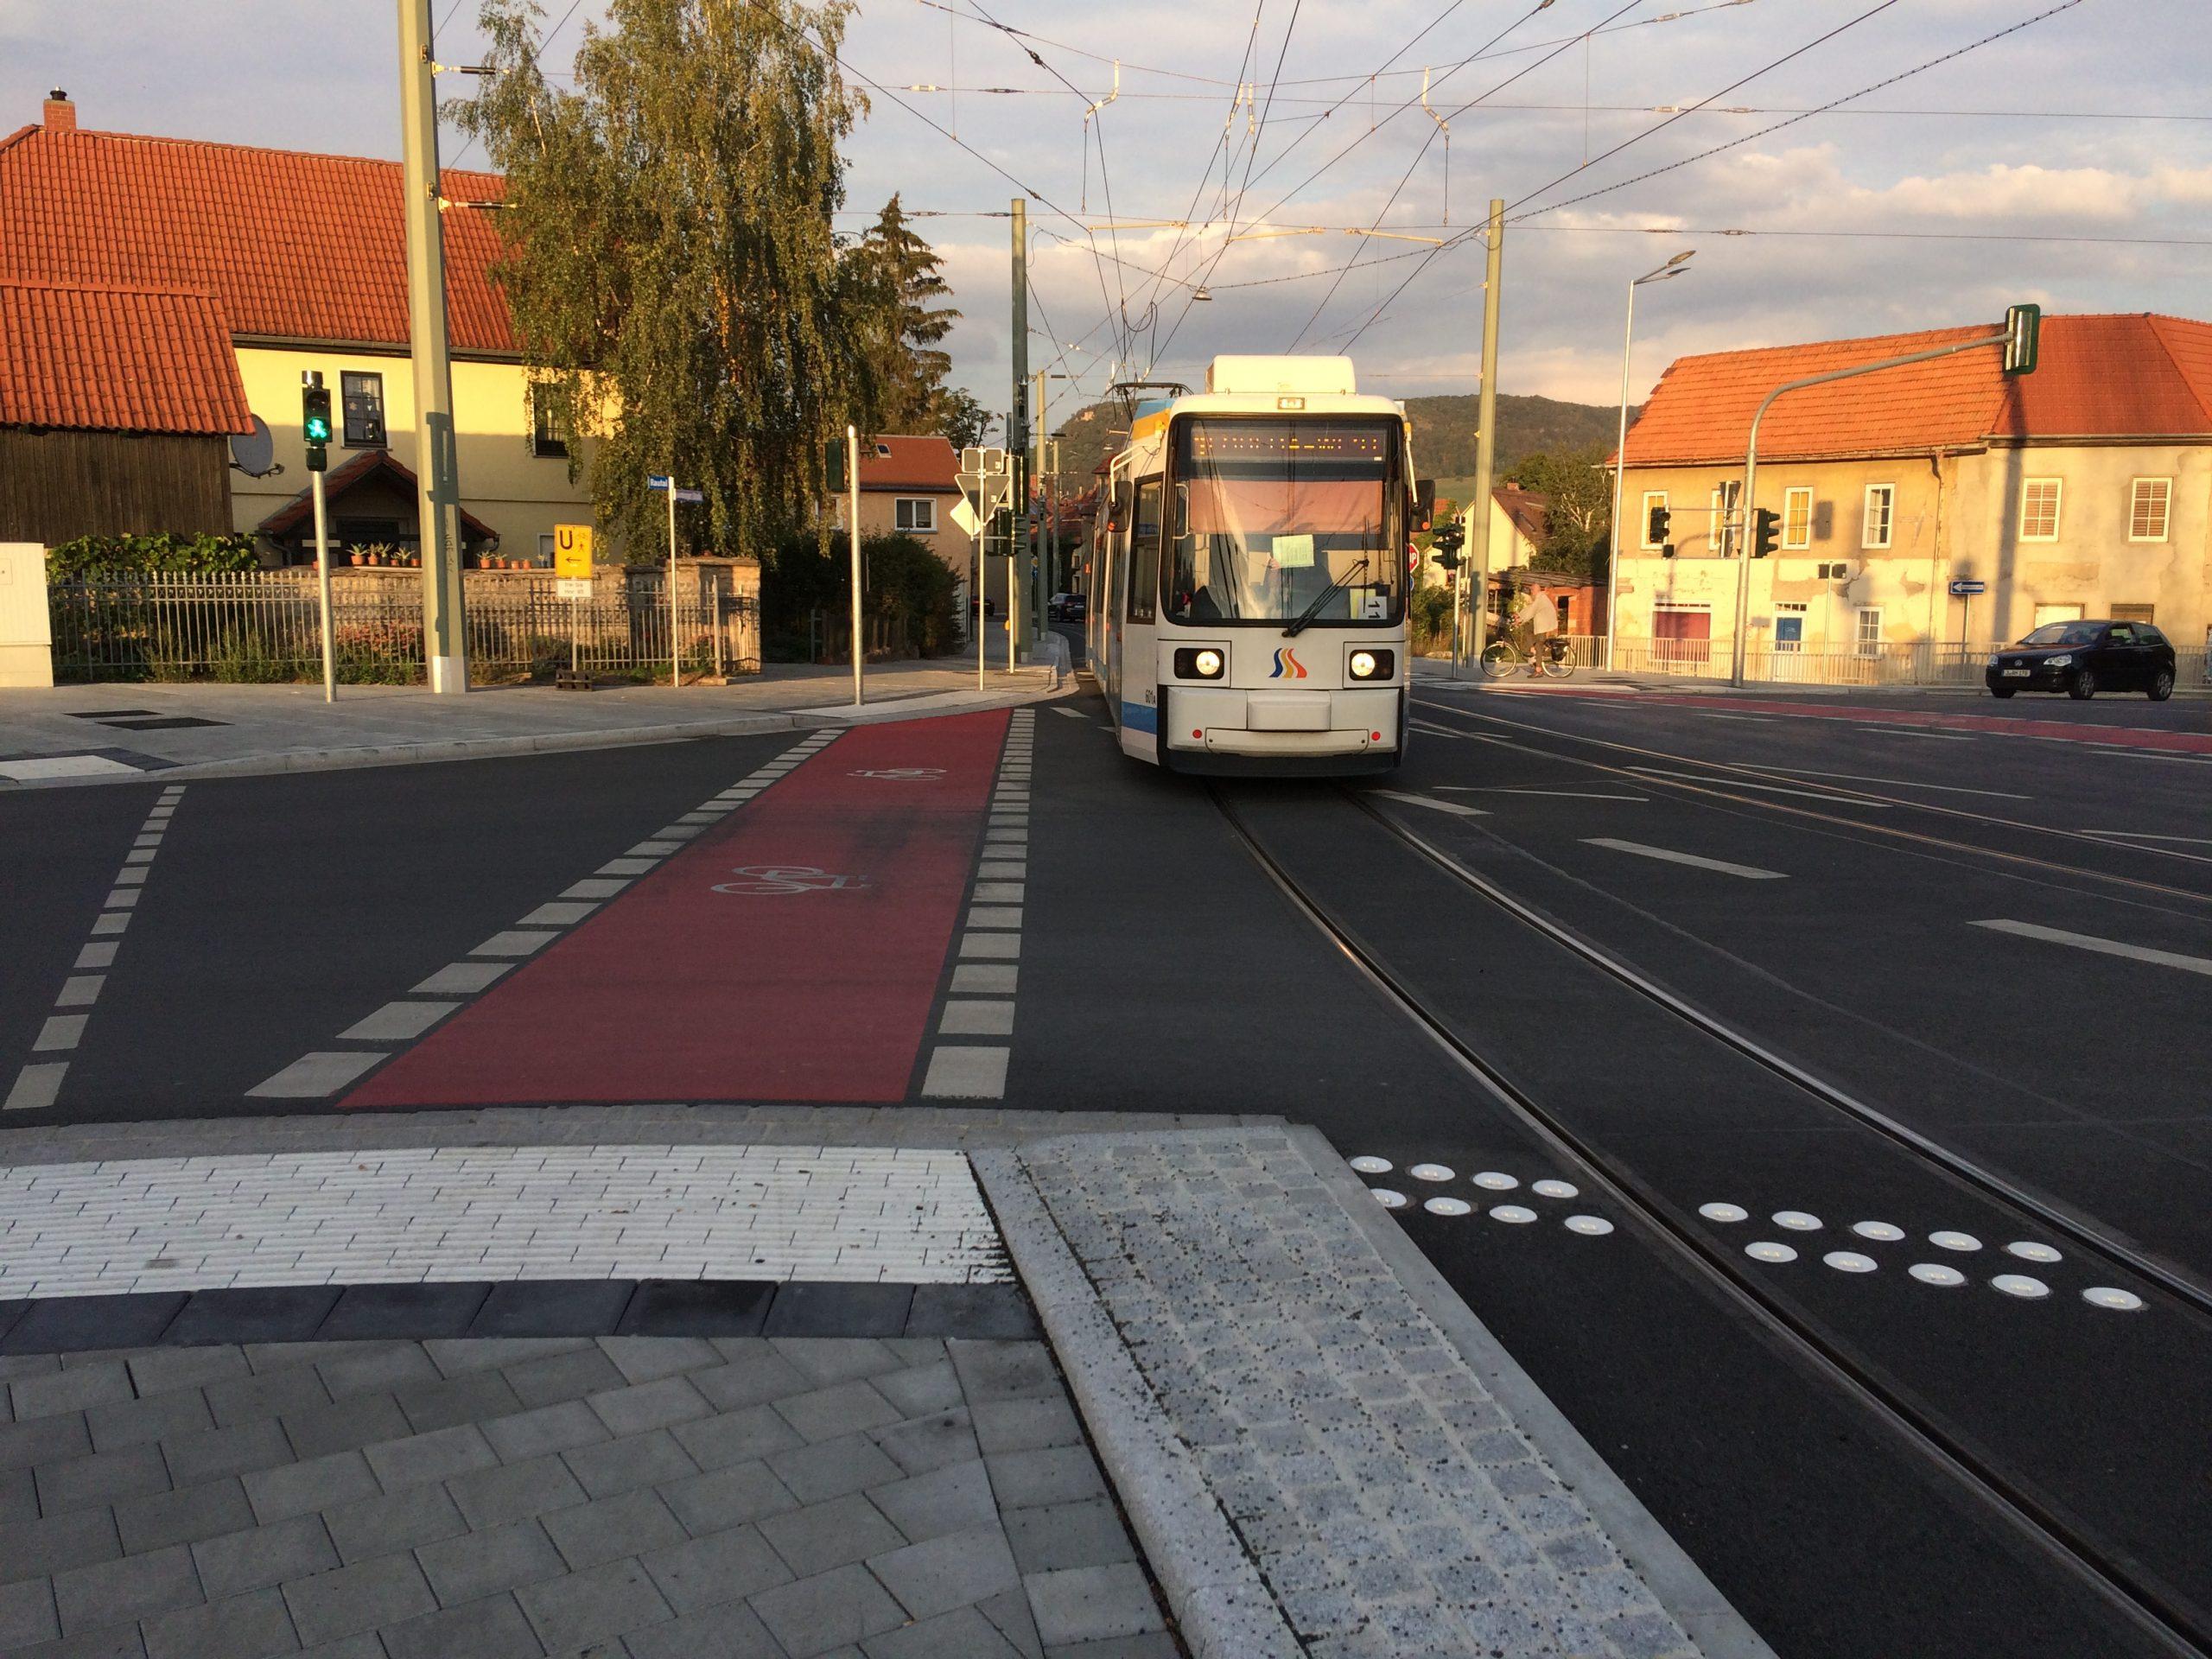 Straßenbahn Jena-Nord während des Sonnenuntergangs